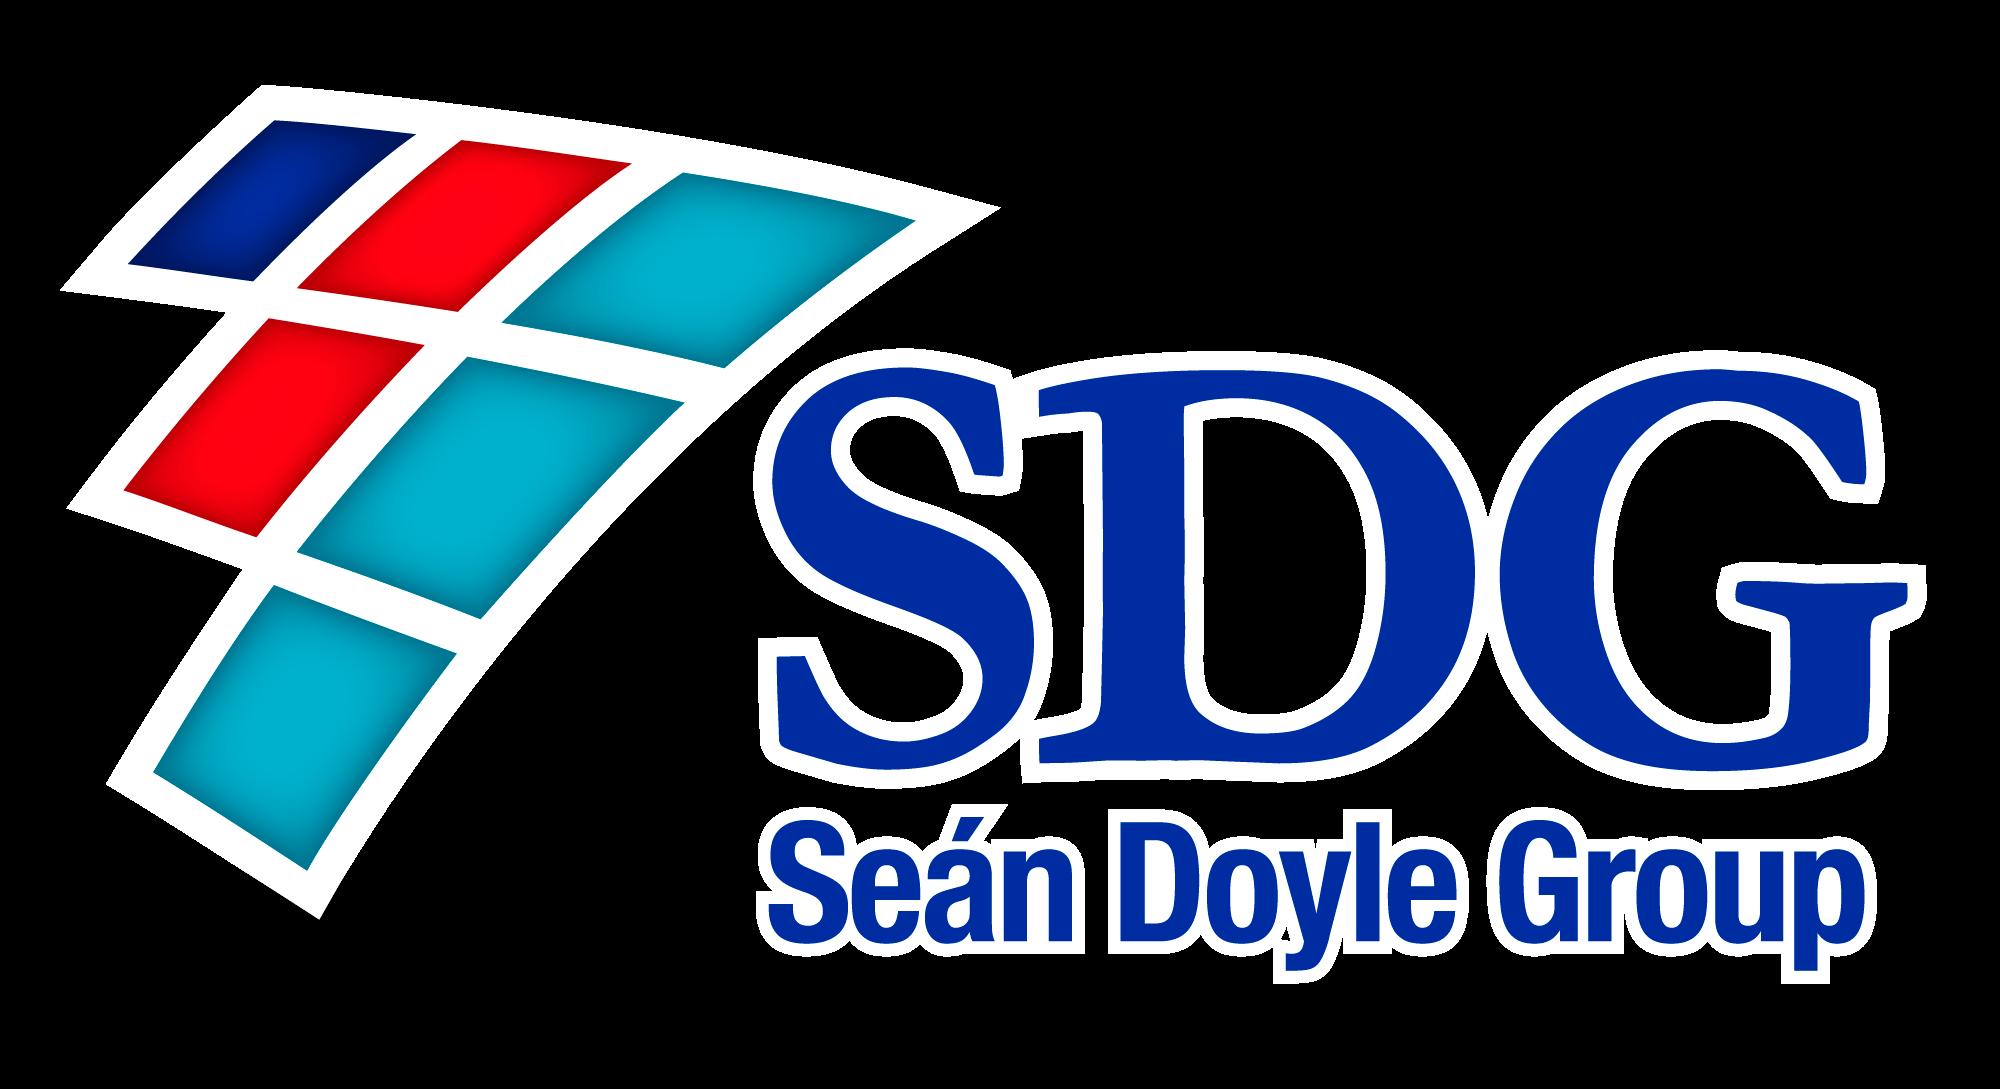 sean-doyle-group-logo